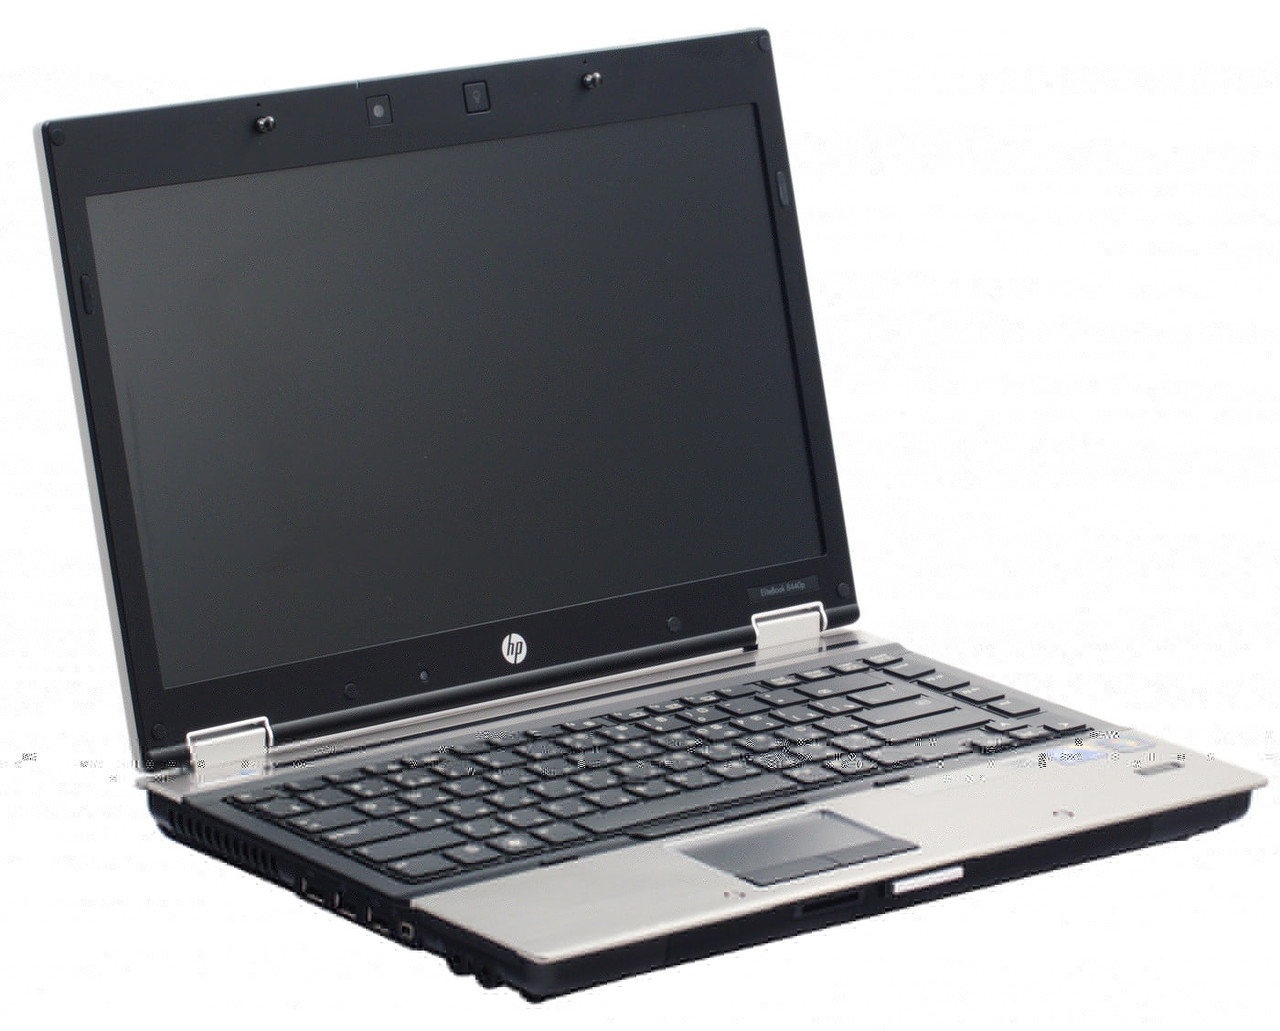 Ноутбук бу HP 8440p Core i5 m520 2.40 GHz/4 Gb/160 Gb, фото 1